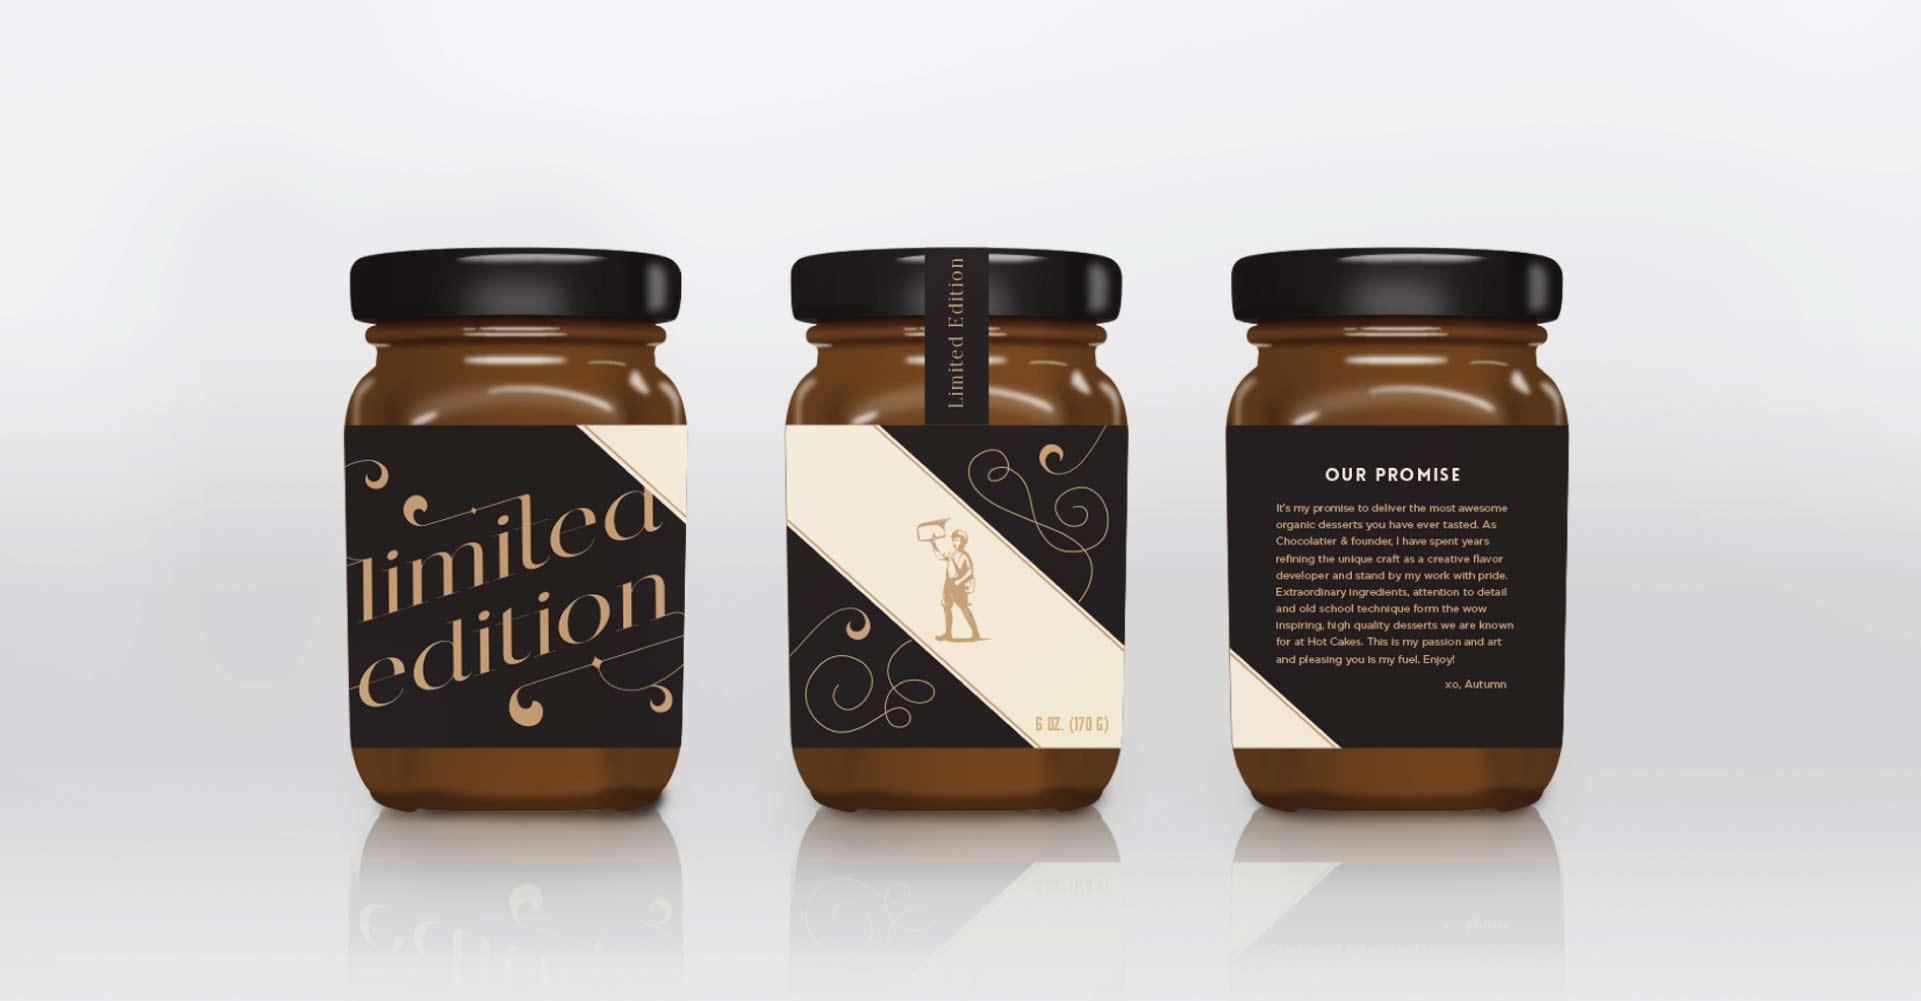 Creative_Retail_Packaging_Branding_Identity_Package_Design_HotCakes_11.jpg